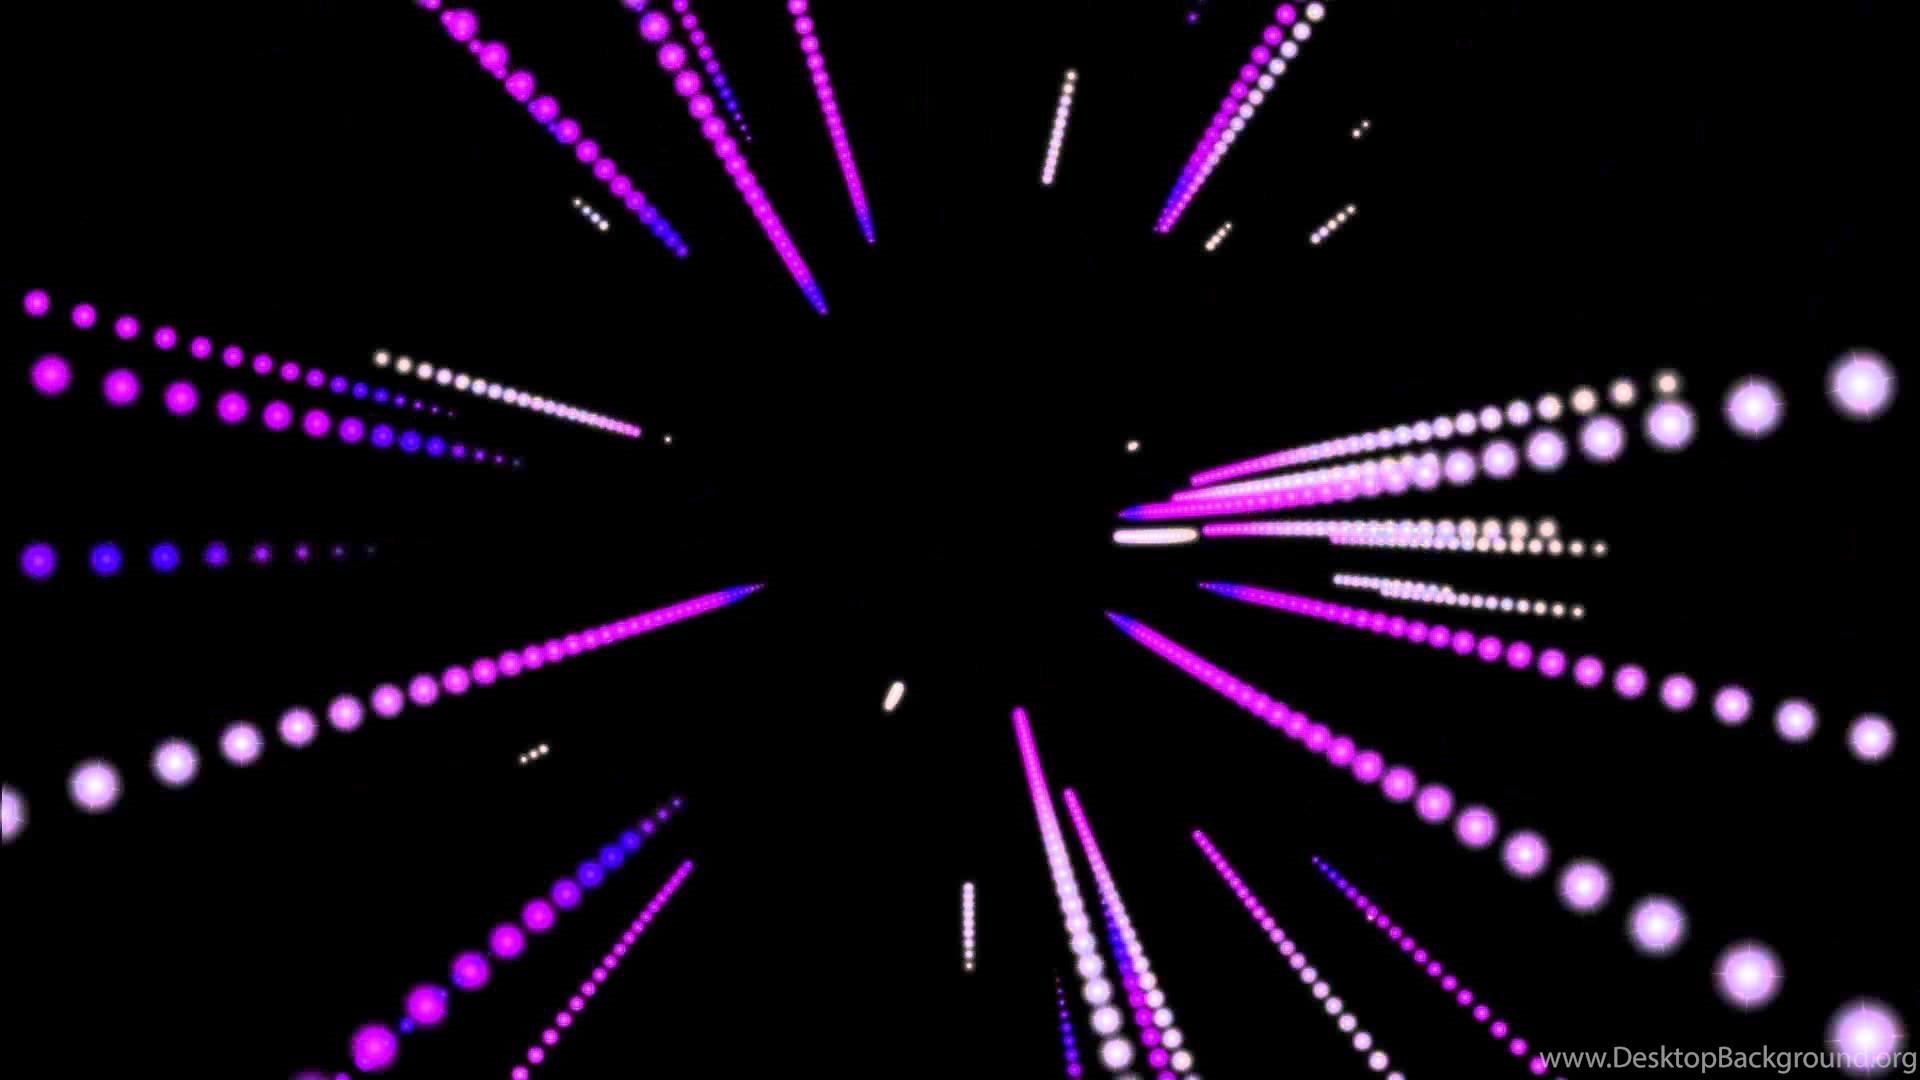 Violet Laser Animation Black Screen Free Footage Hd Youtube Desktop